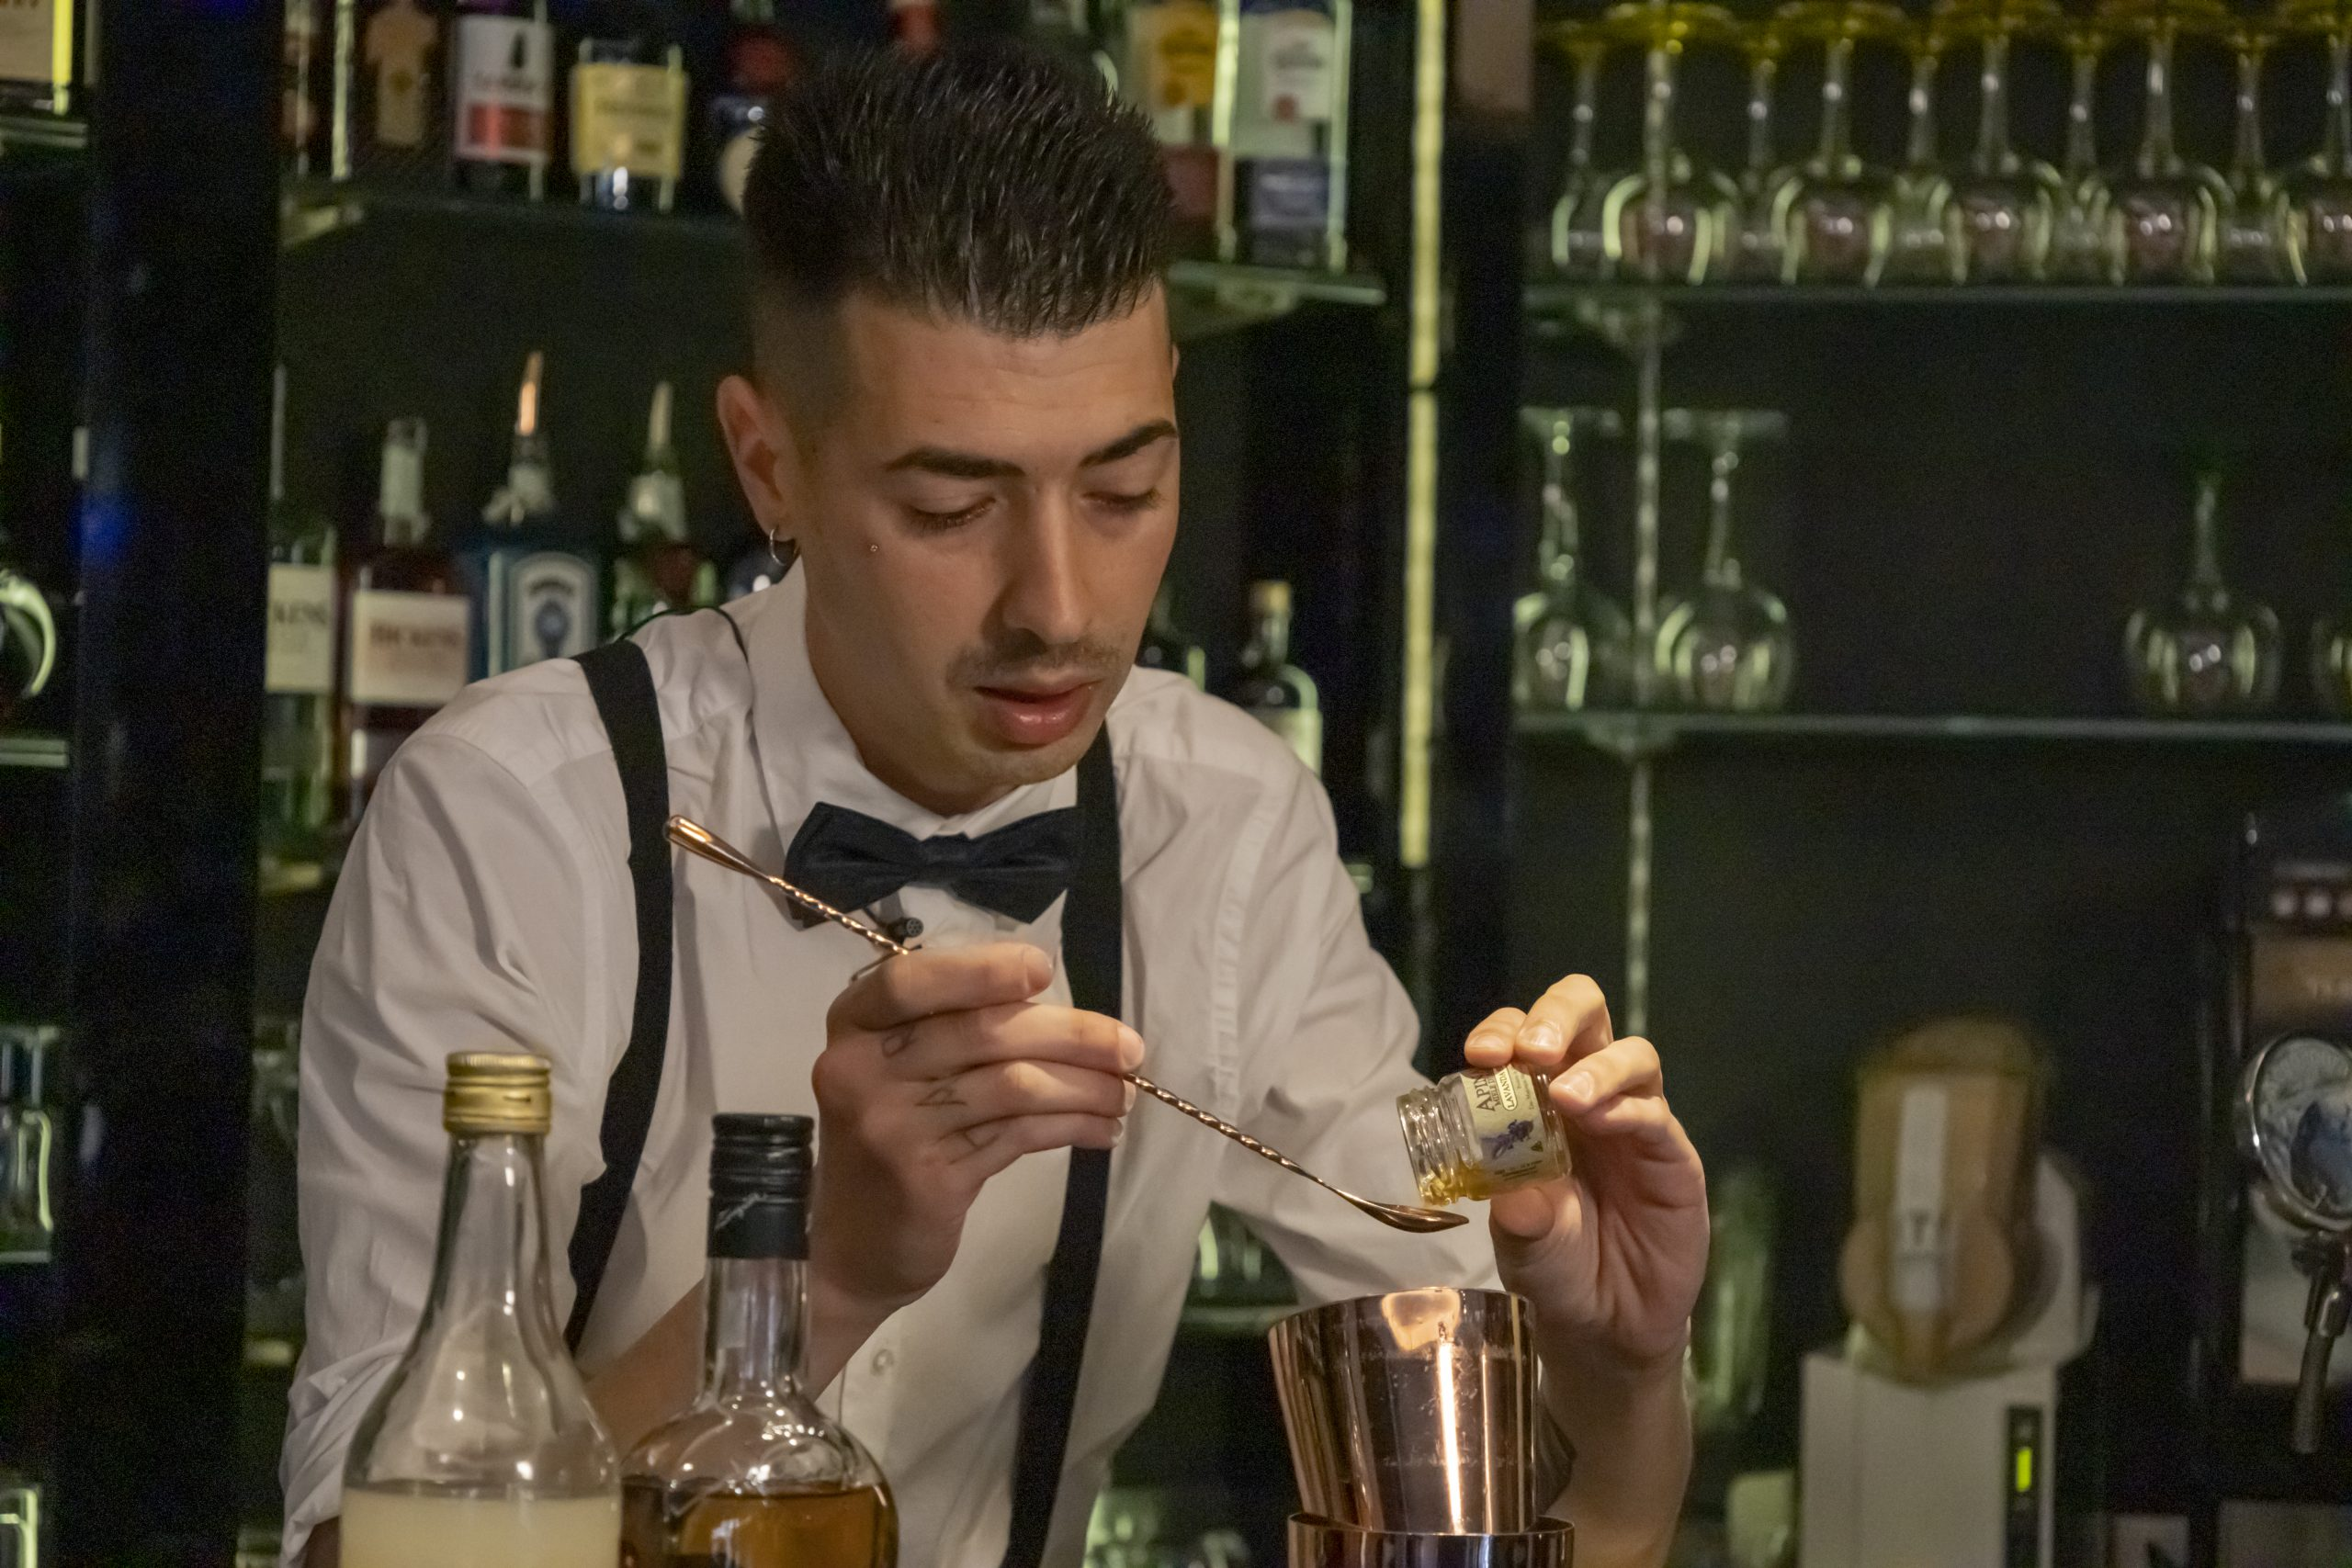 Bar Milano 2.0